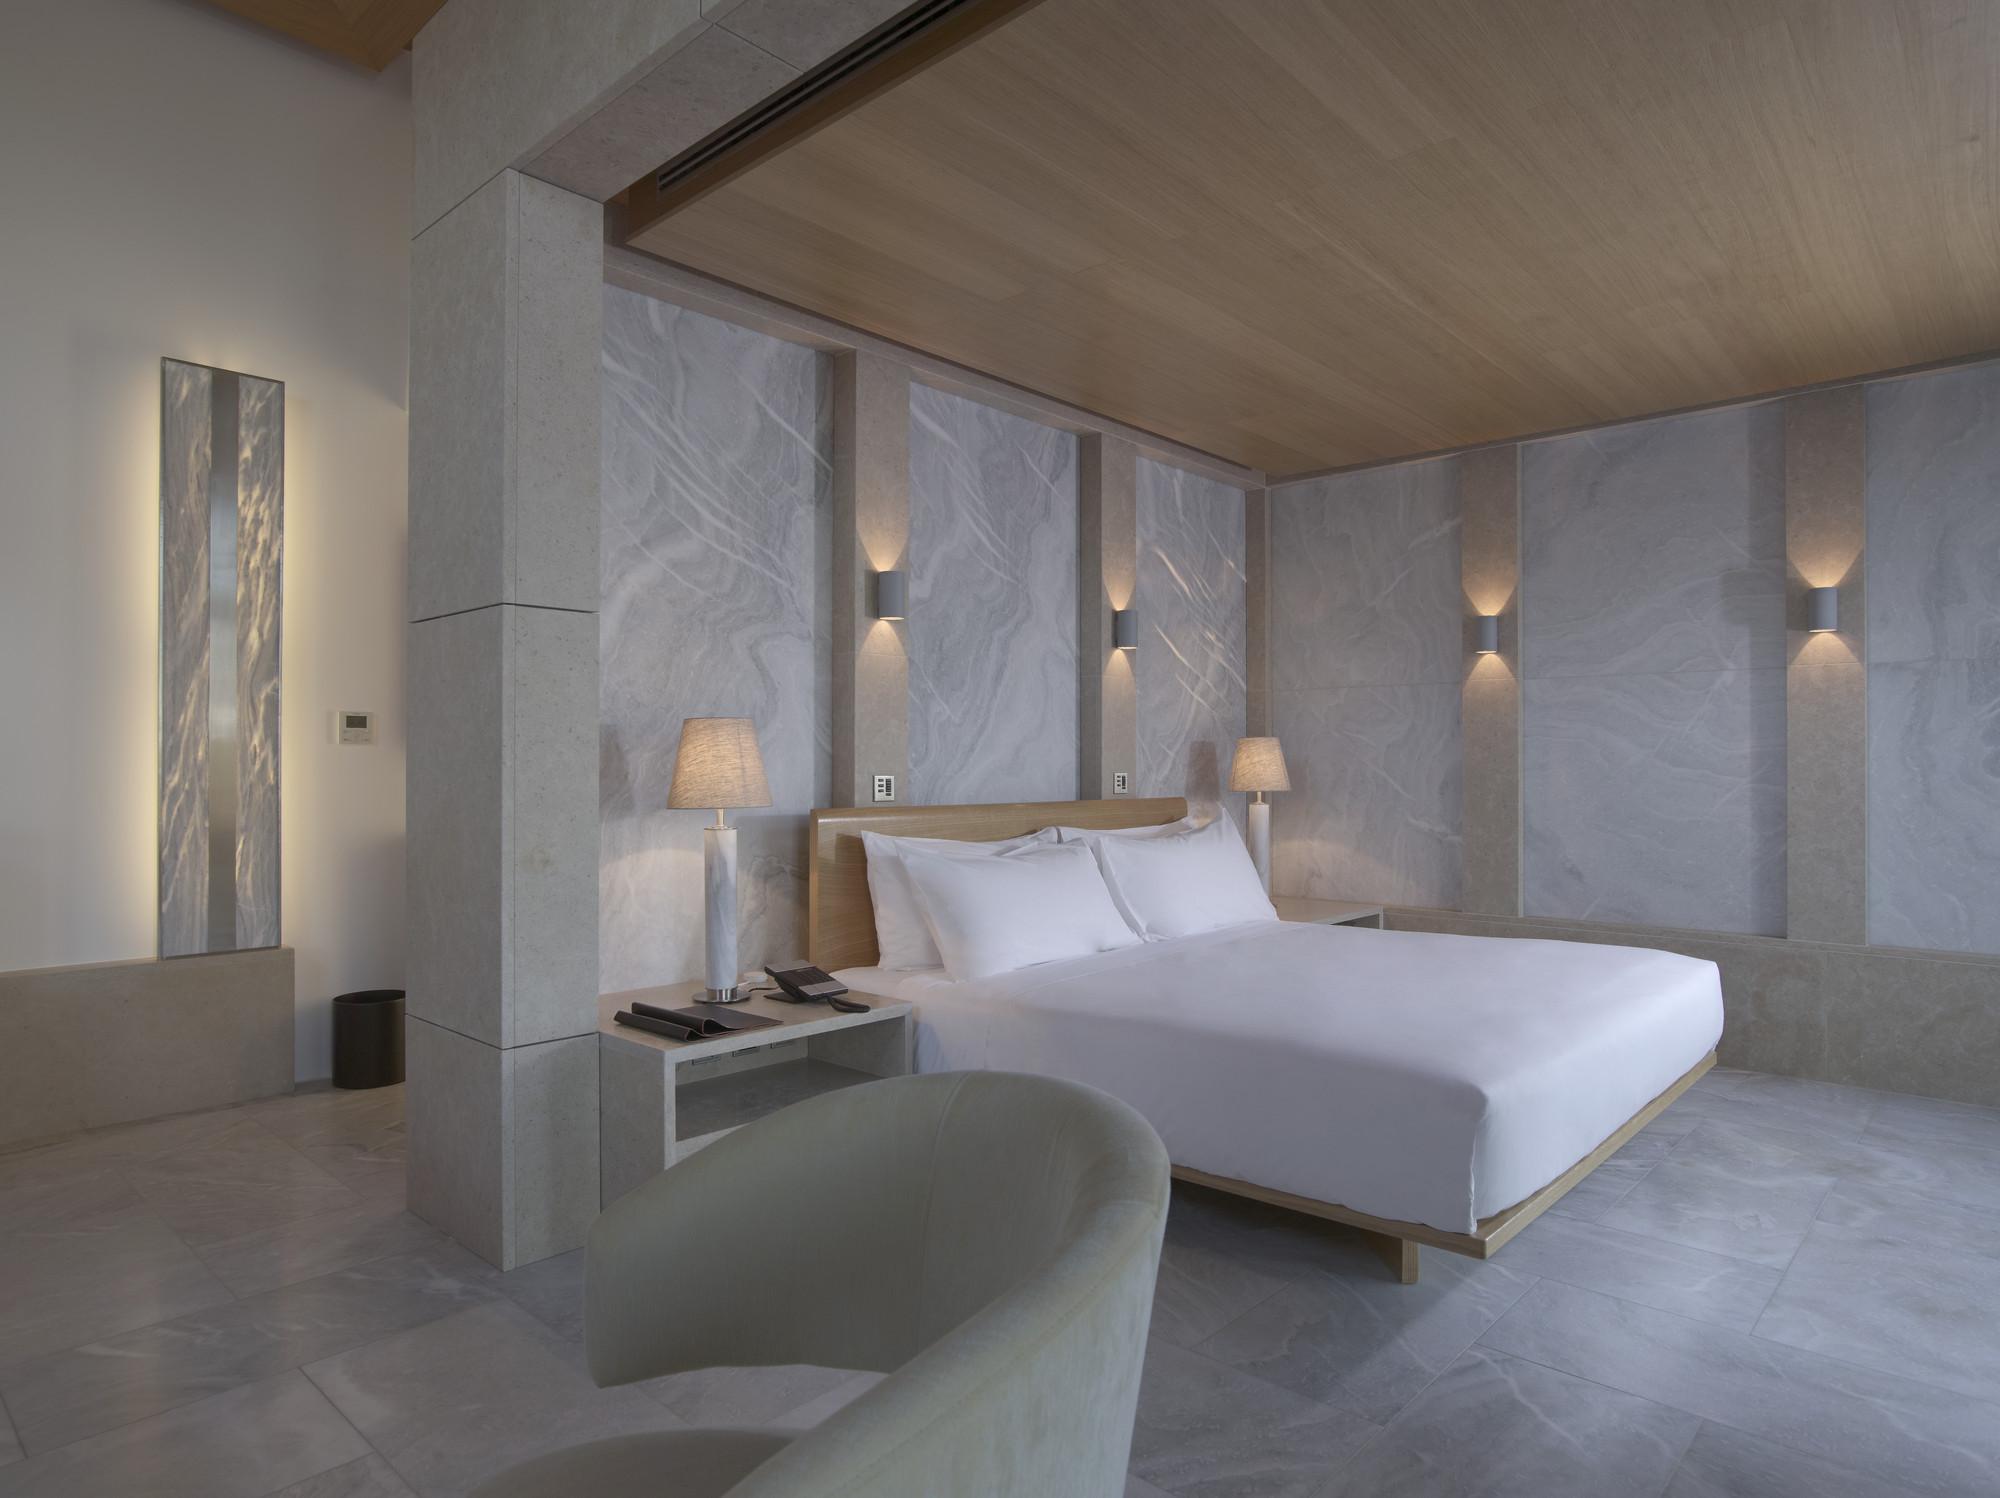 RS588_Amanzoe - Pavillion Bedroom-lpr